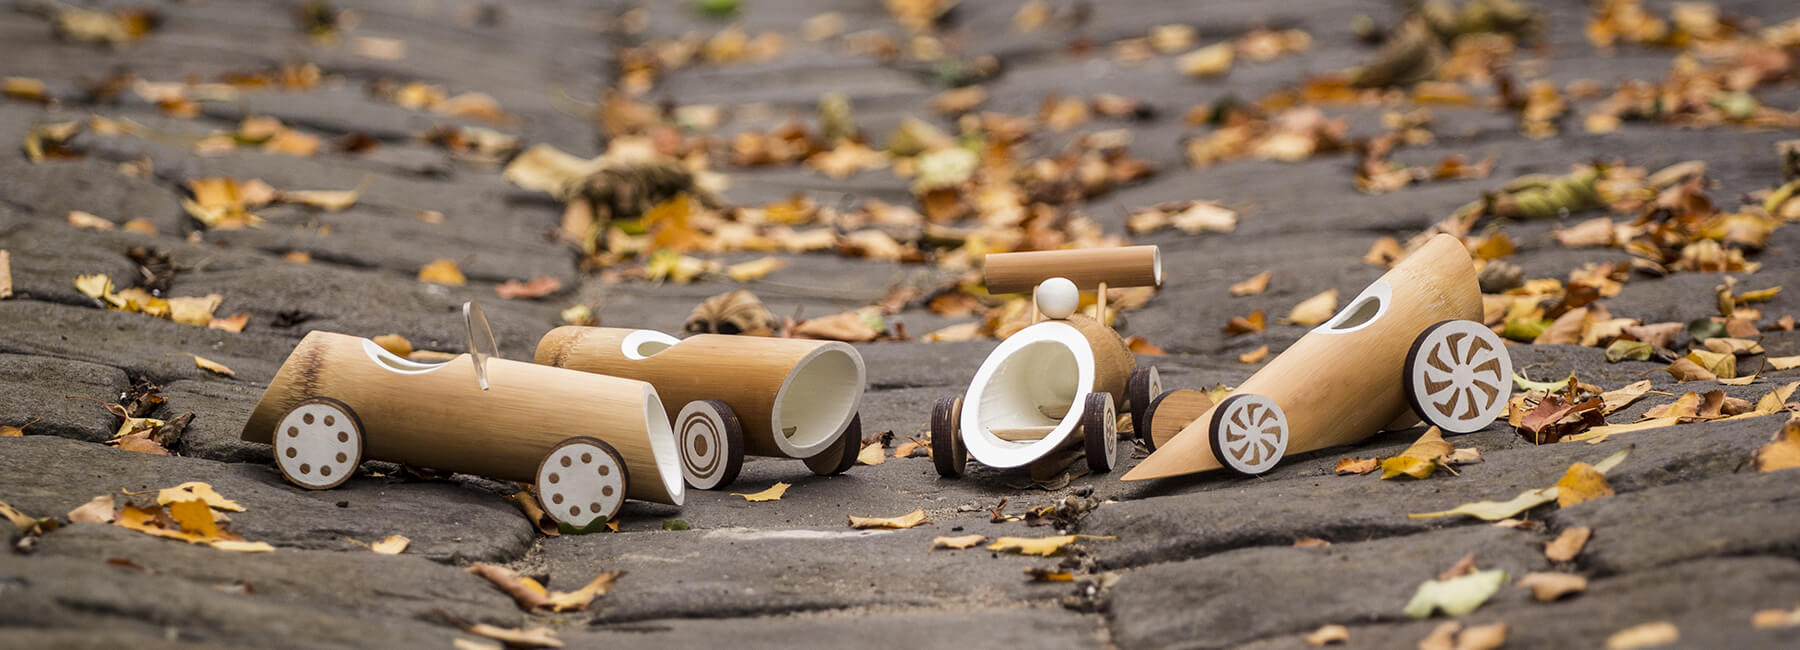 Машинки из бамбука, фото 1